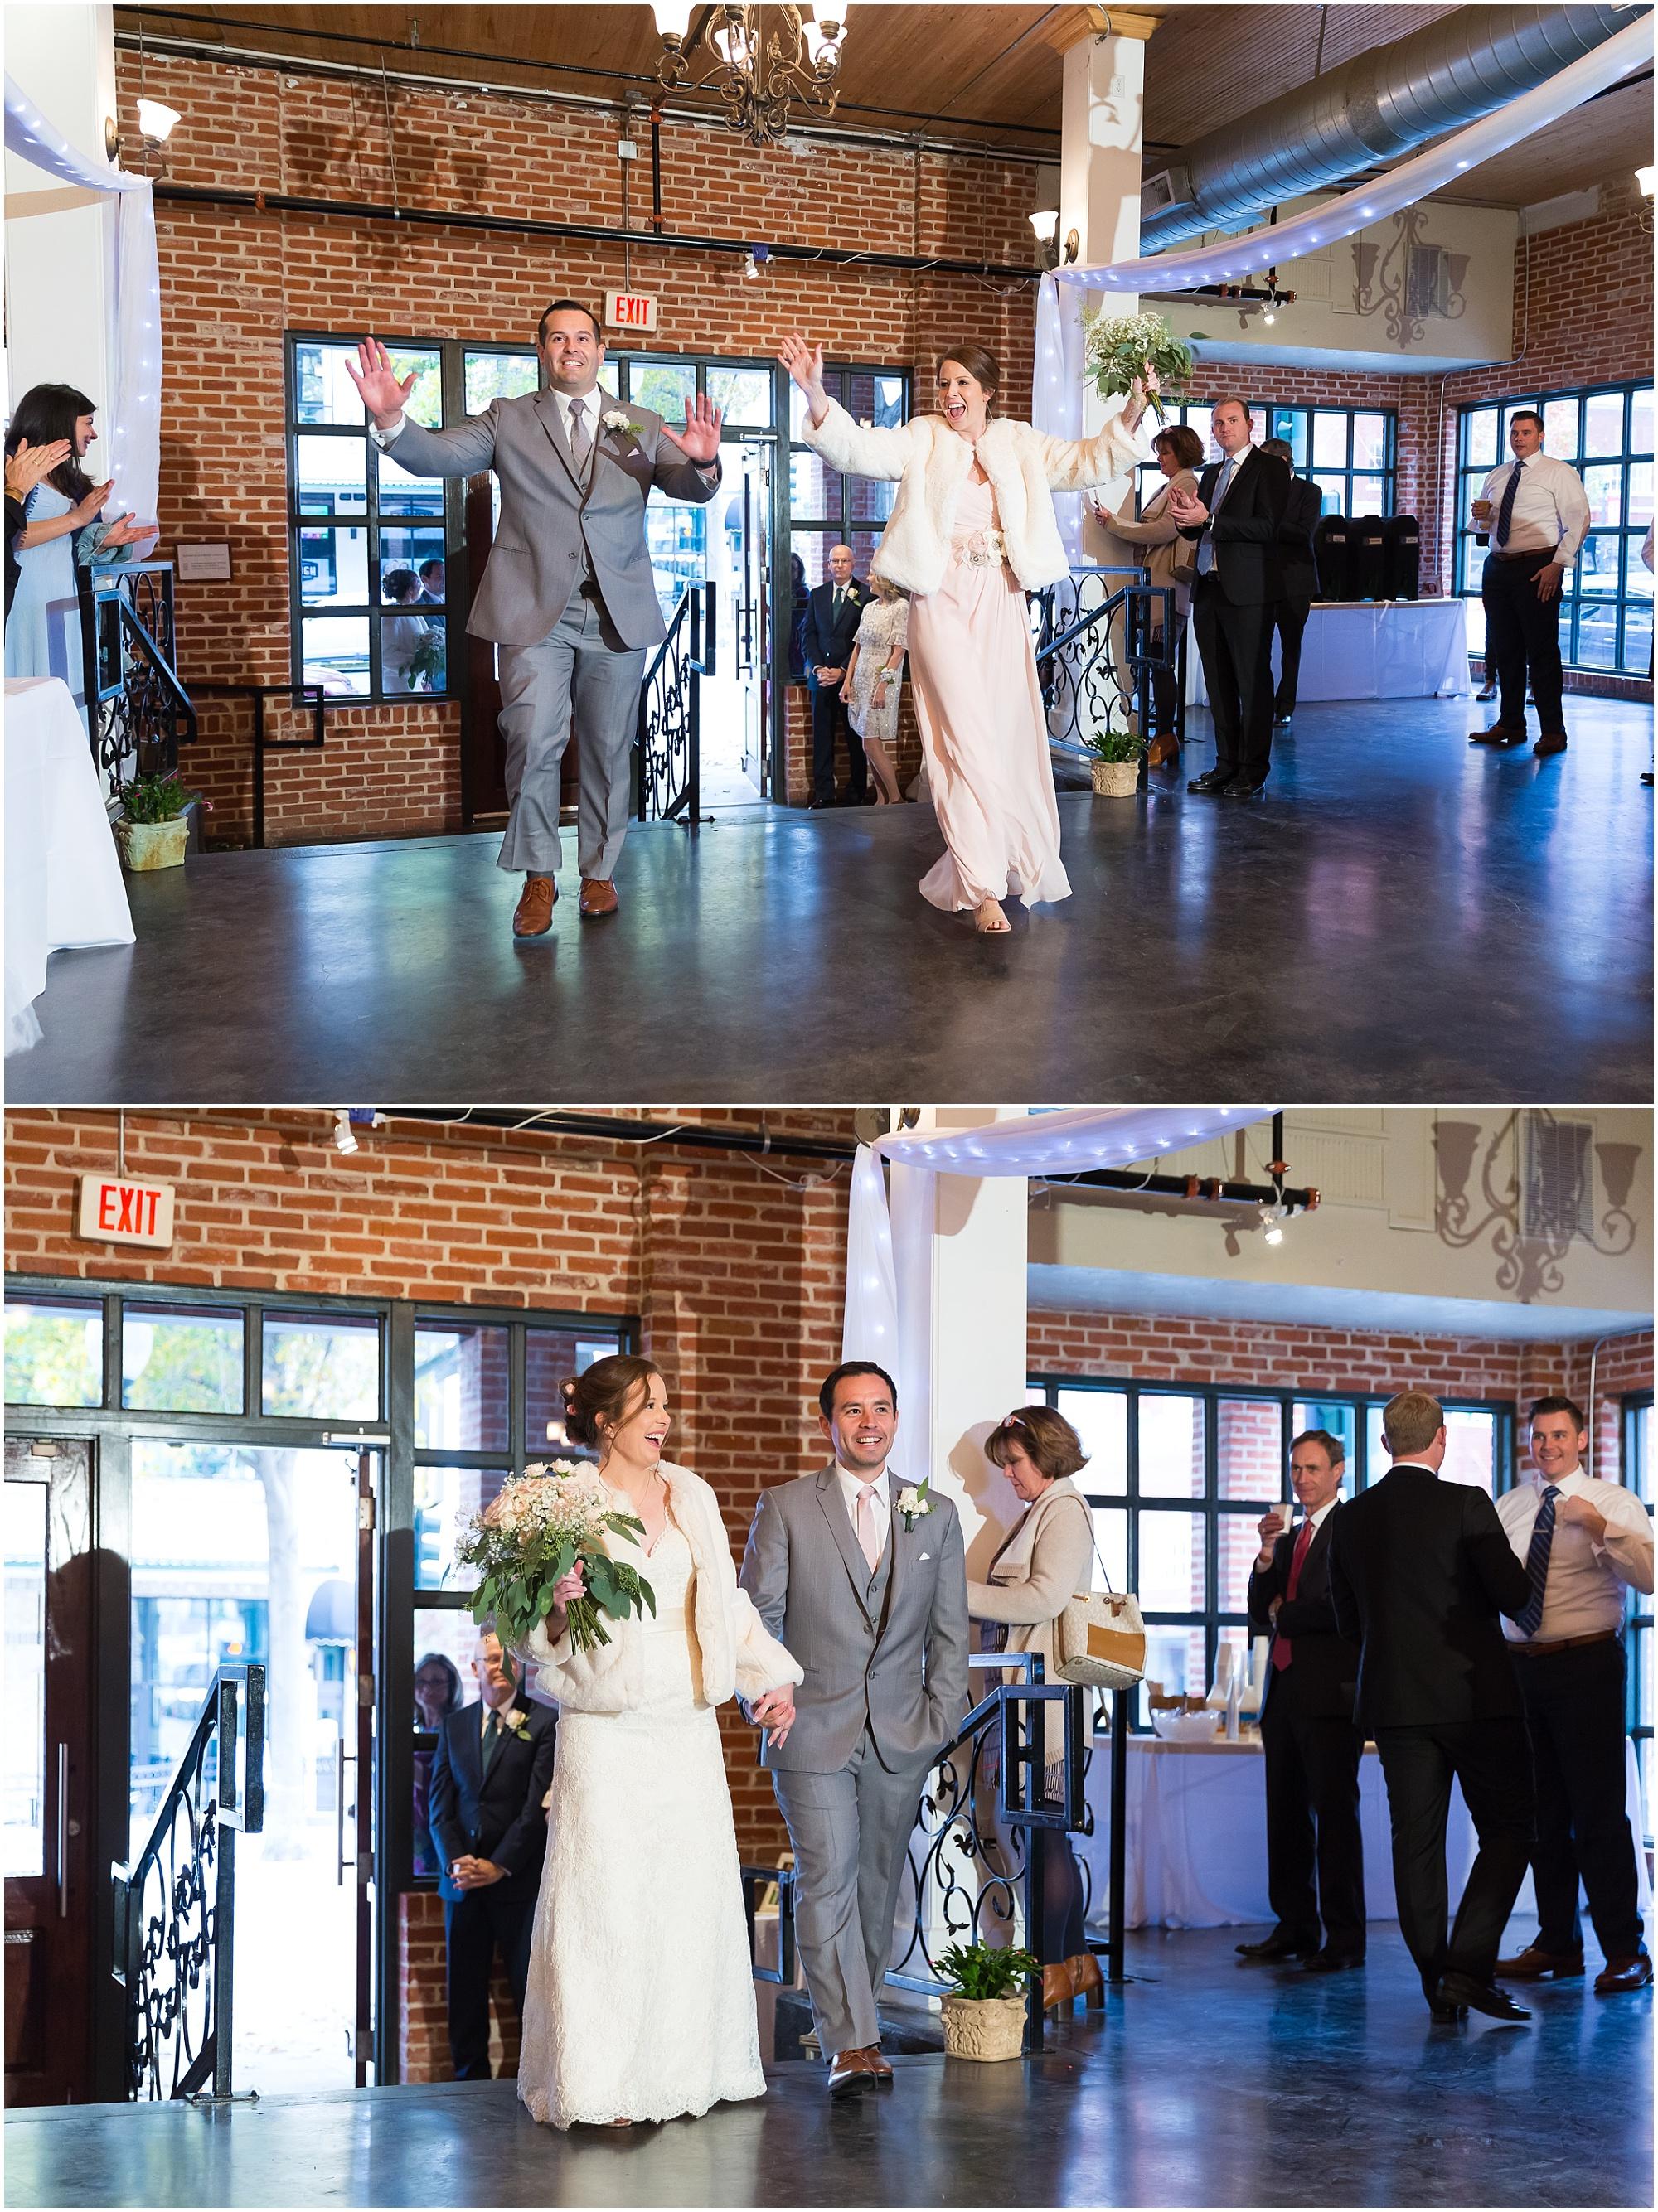 Downtown-Waco-Fall-Wedding_0026.jpg